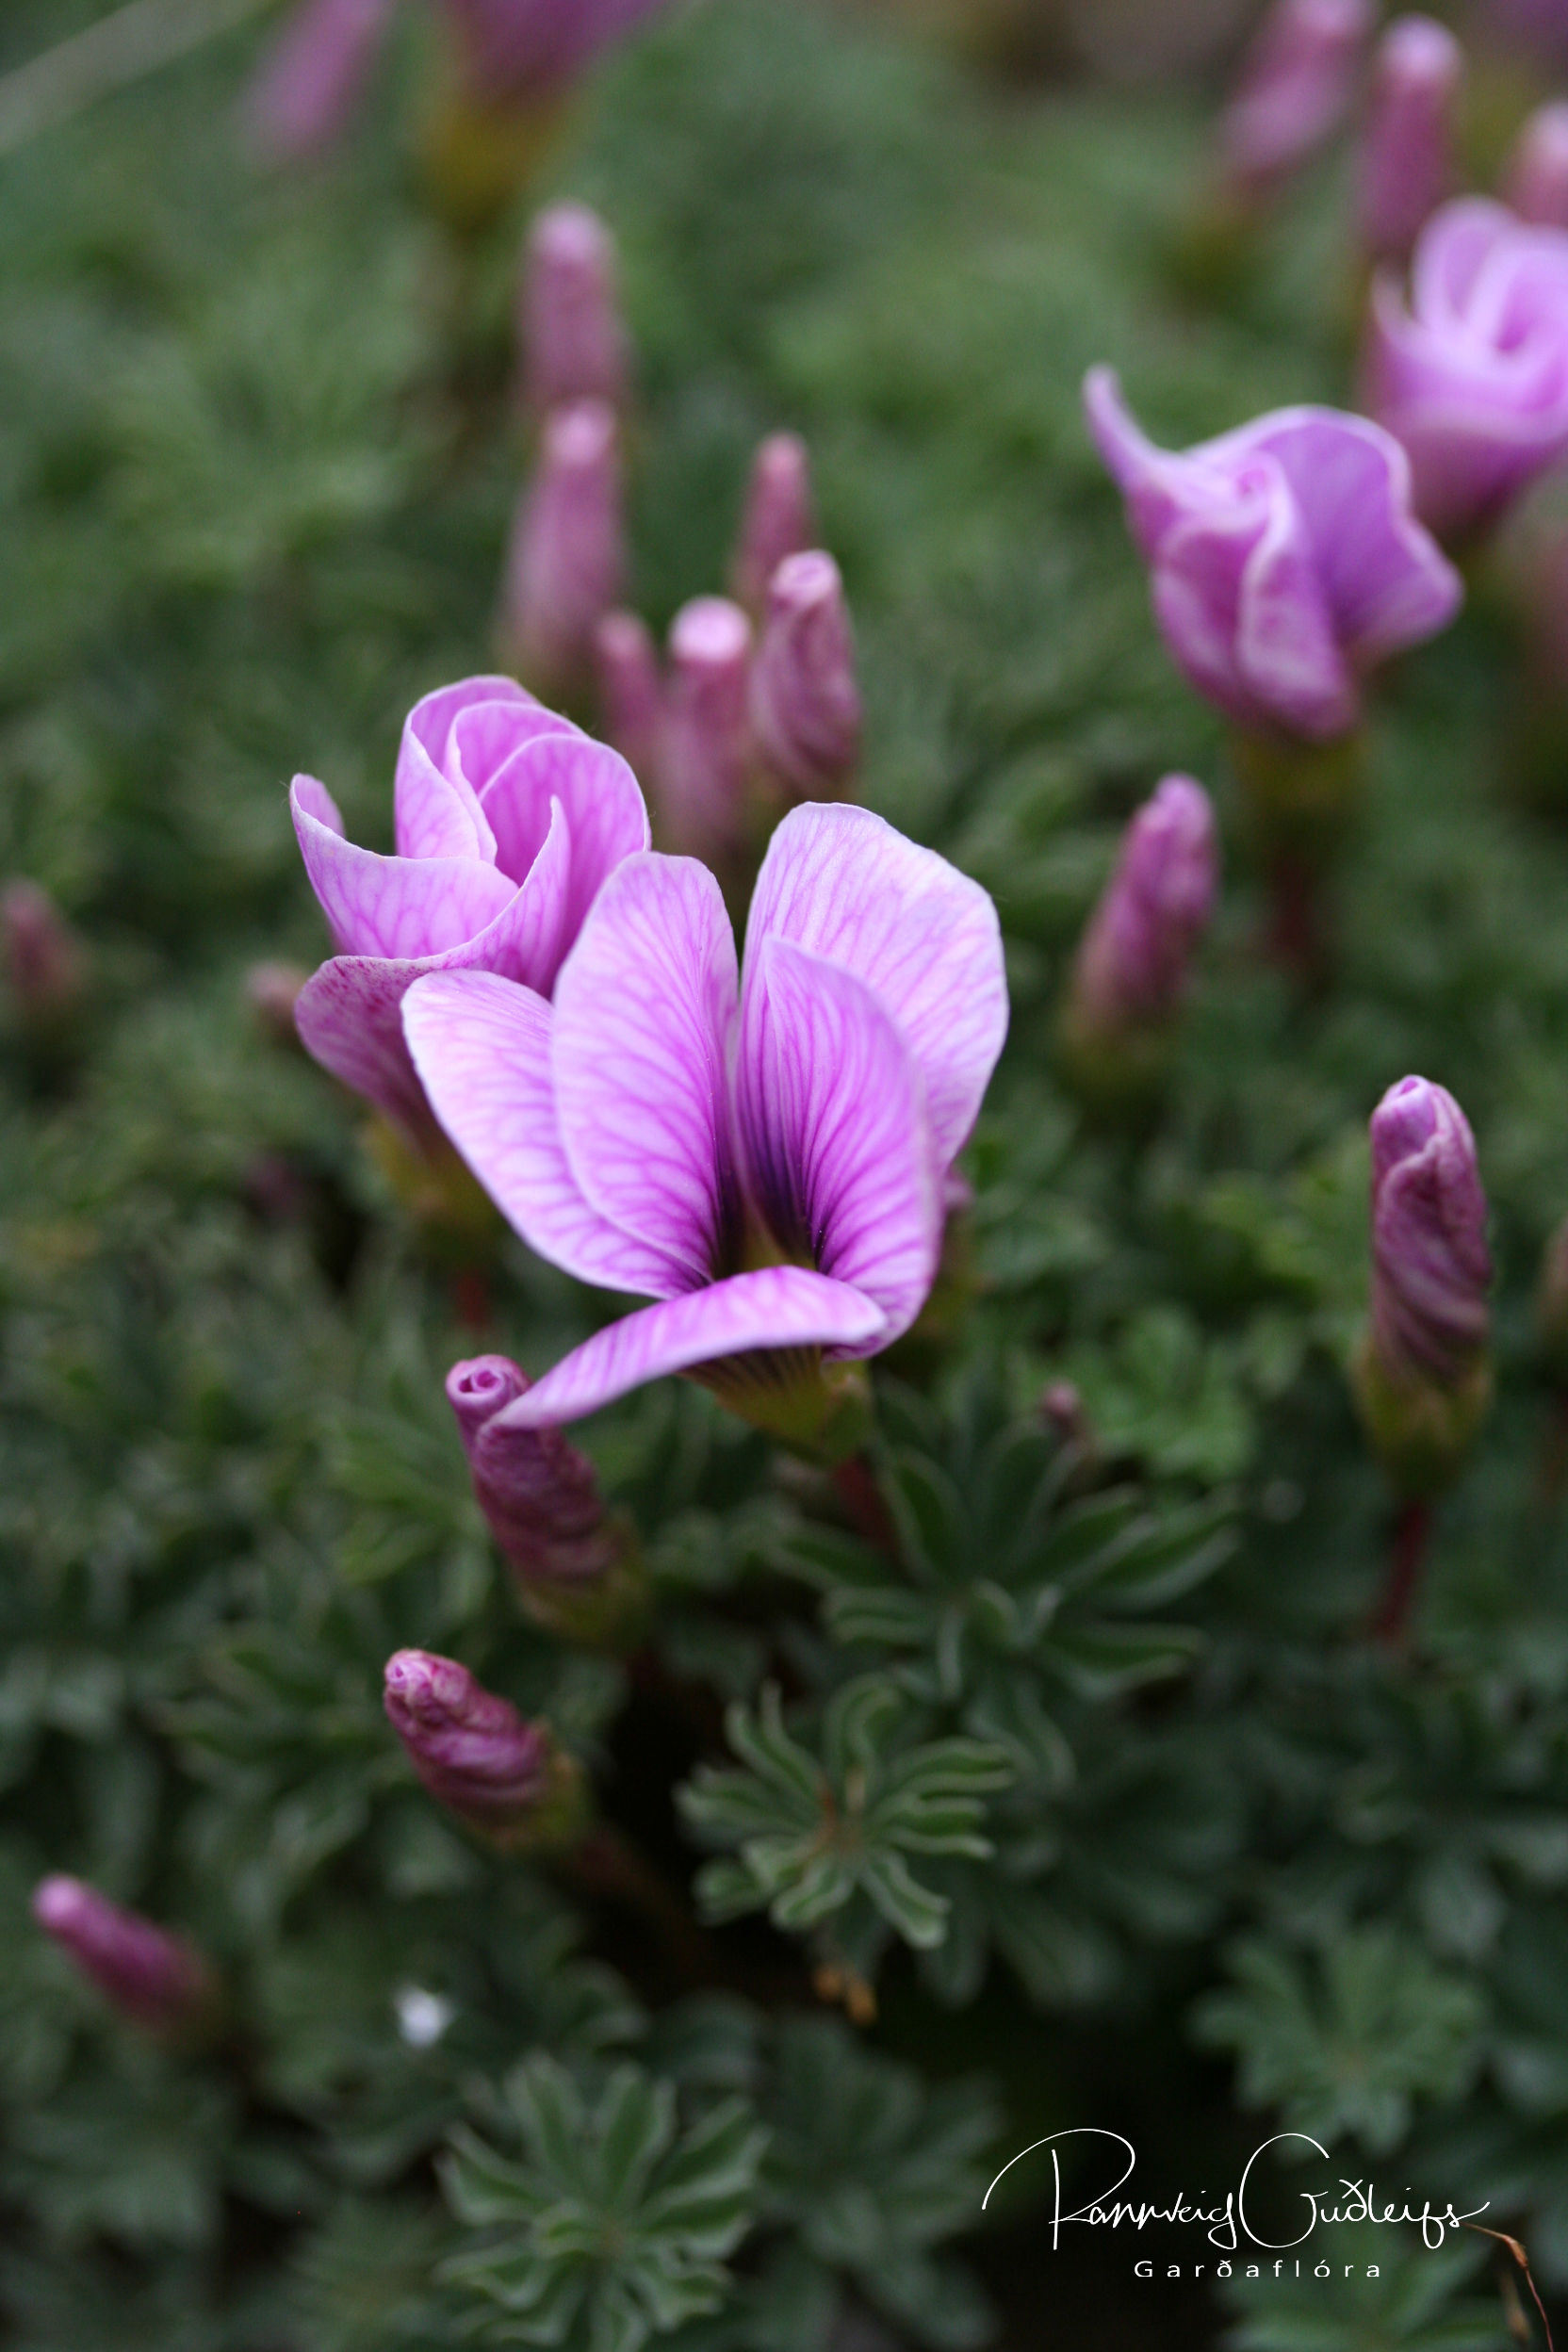 Oxalis enneaphylla 'Ione Hecker'